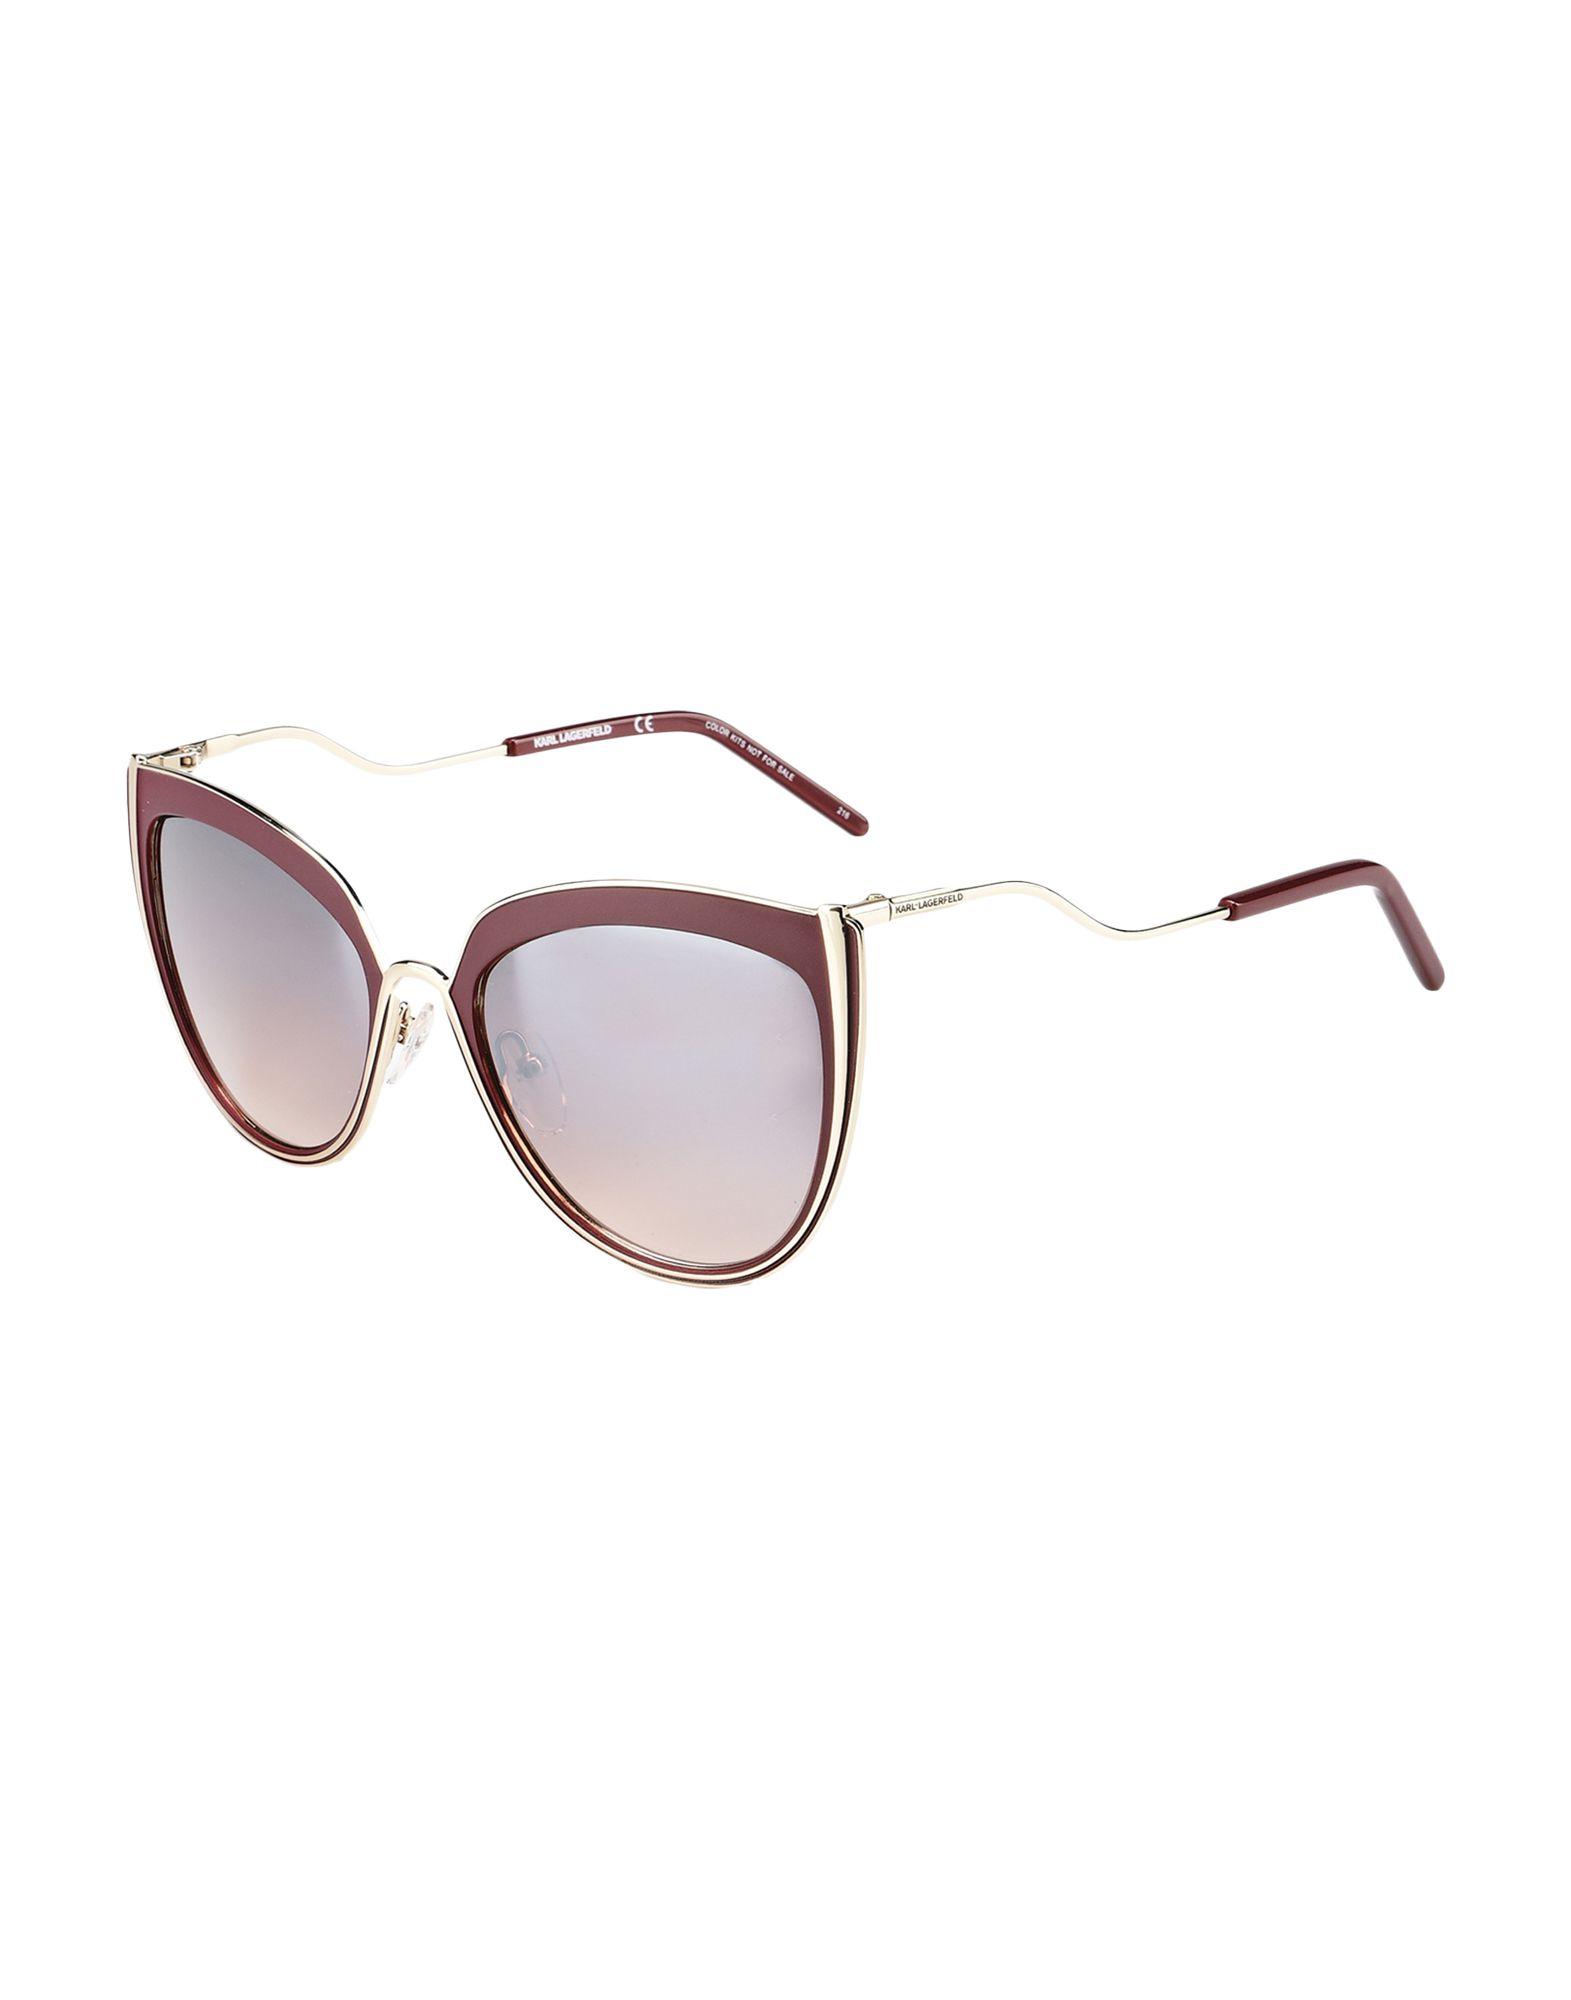 KARL LAGERFELD Солнечные очки karl lagerfeld солнечные очки